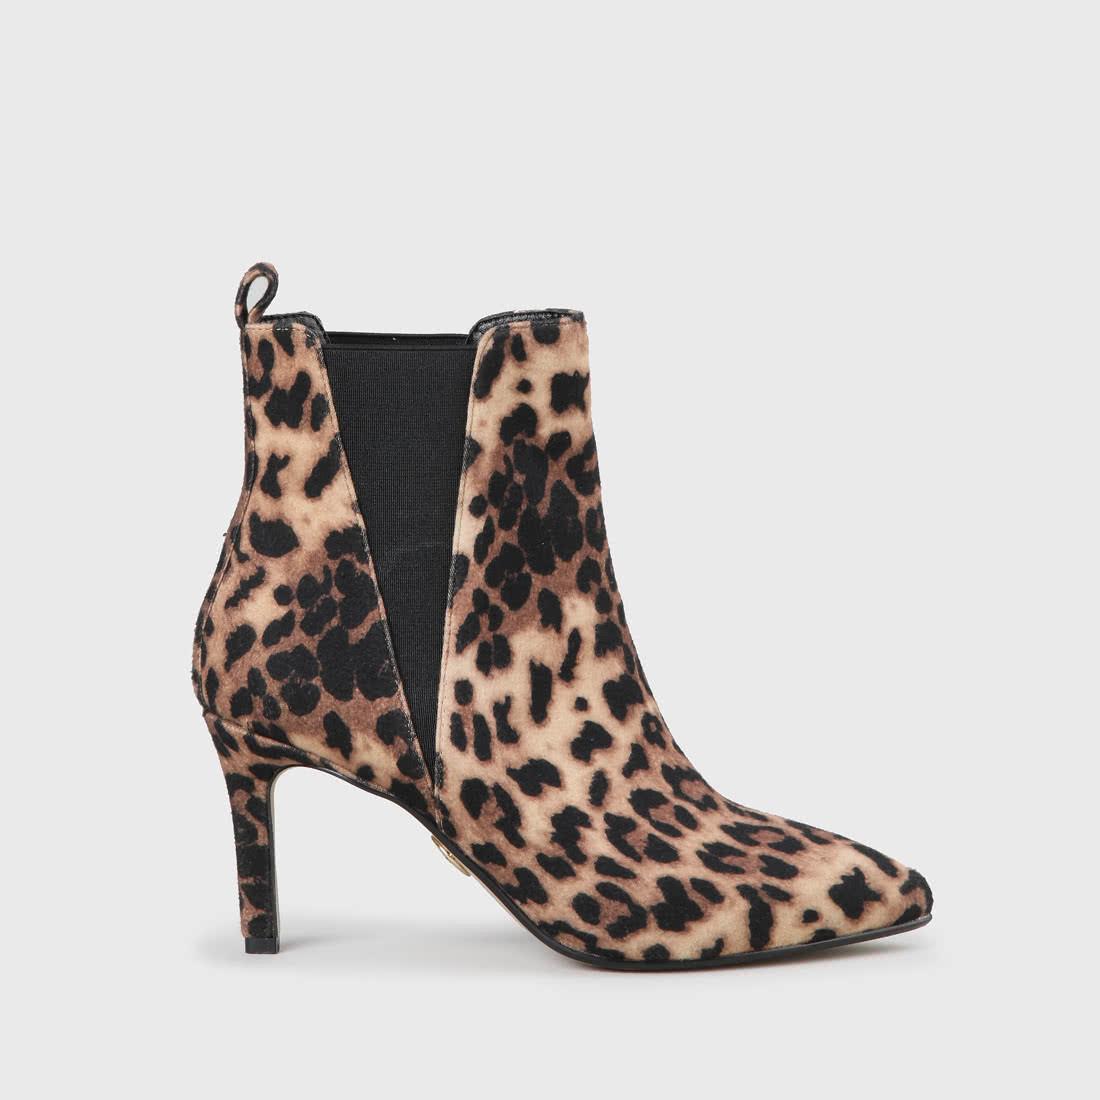 b5870ad7a6 Faya Chelsea Boot leopard print